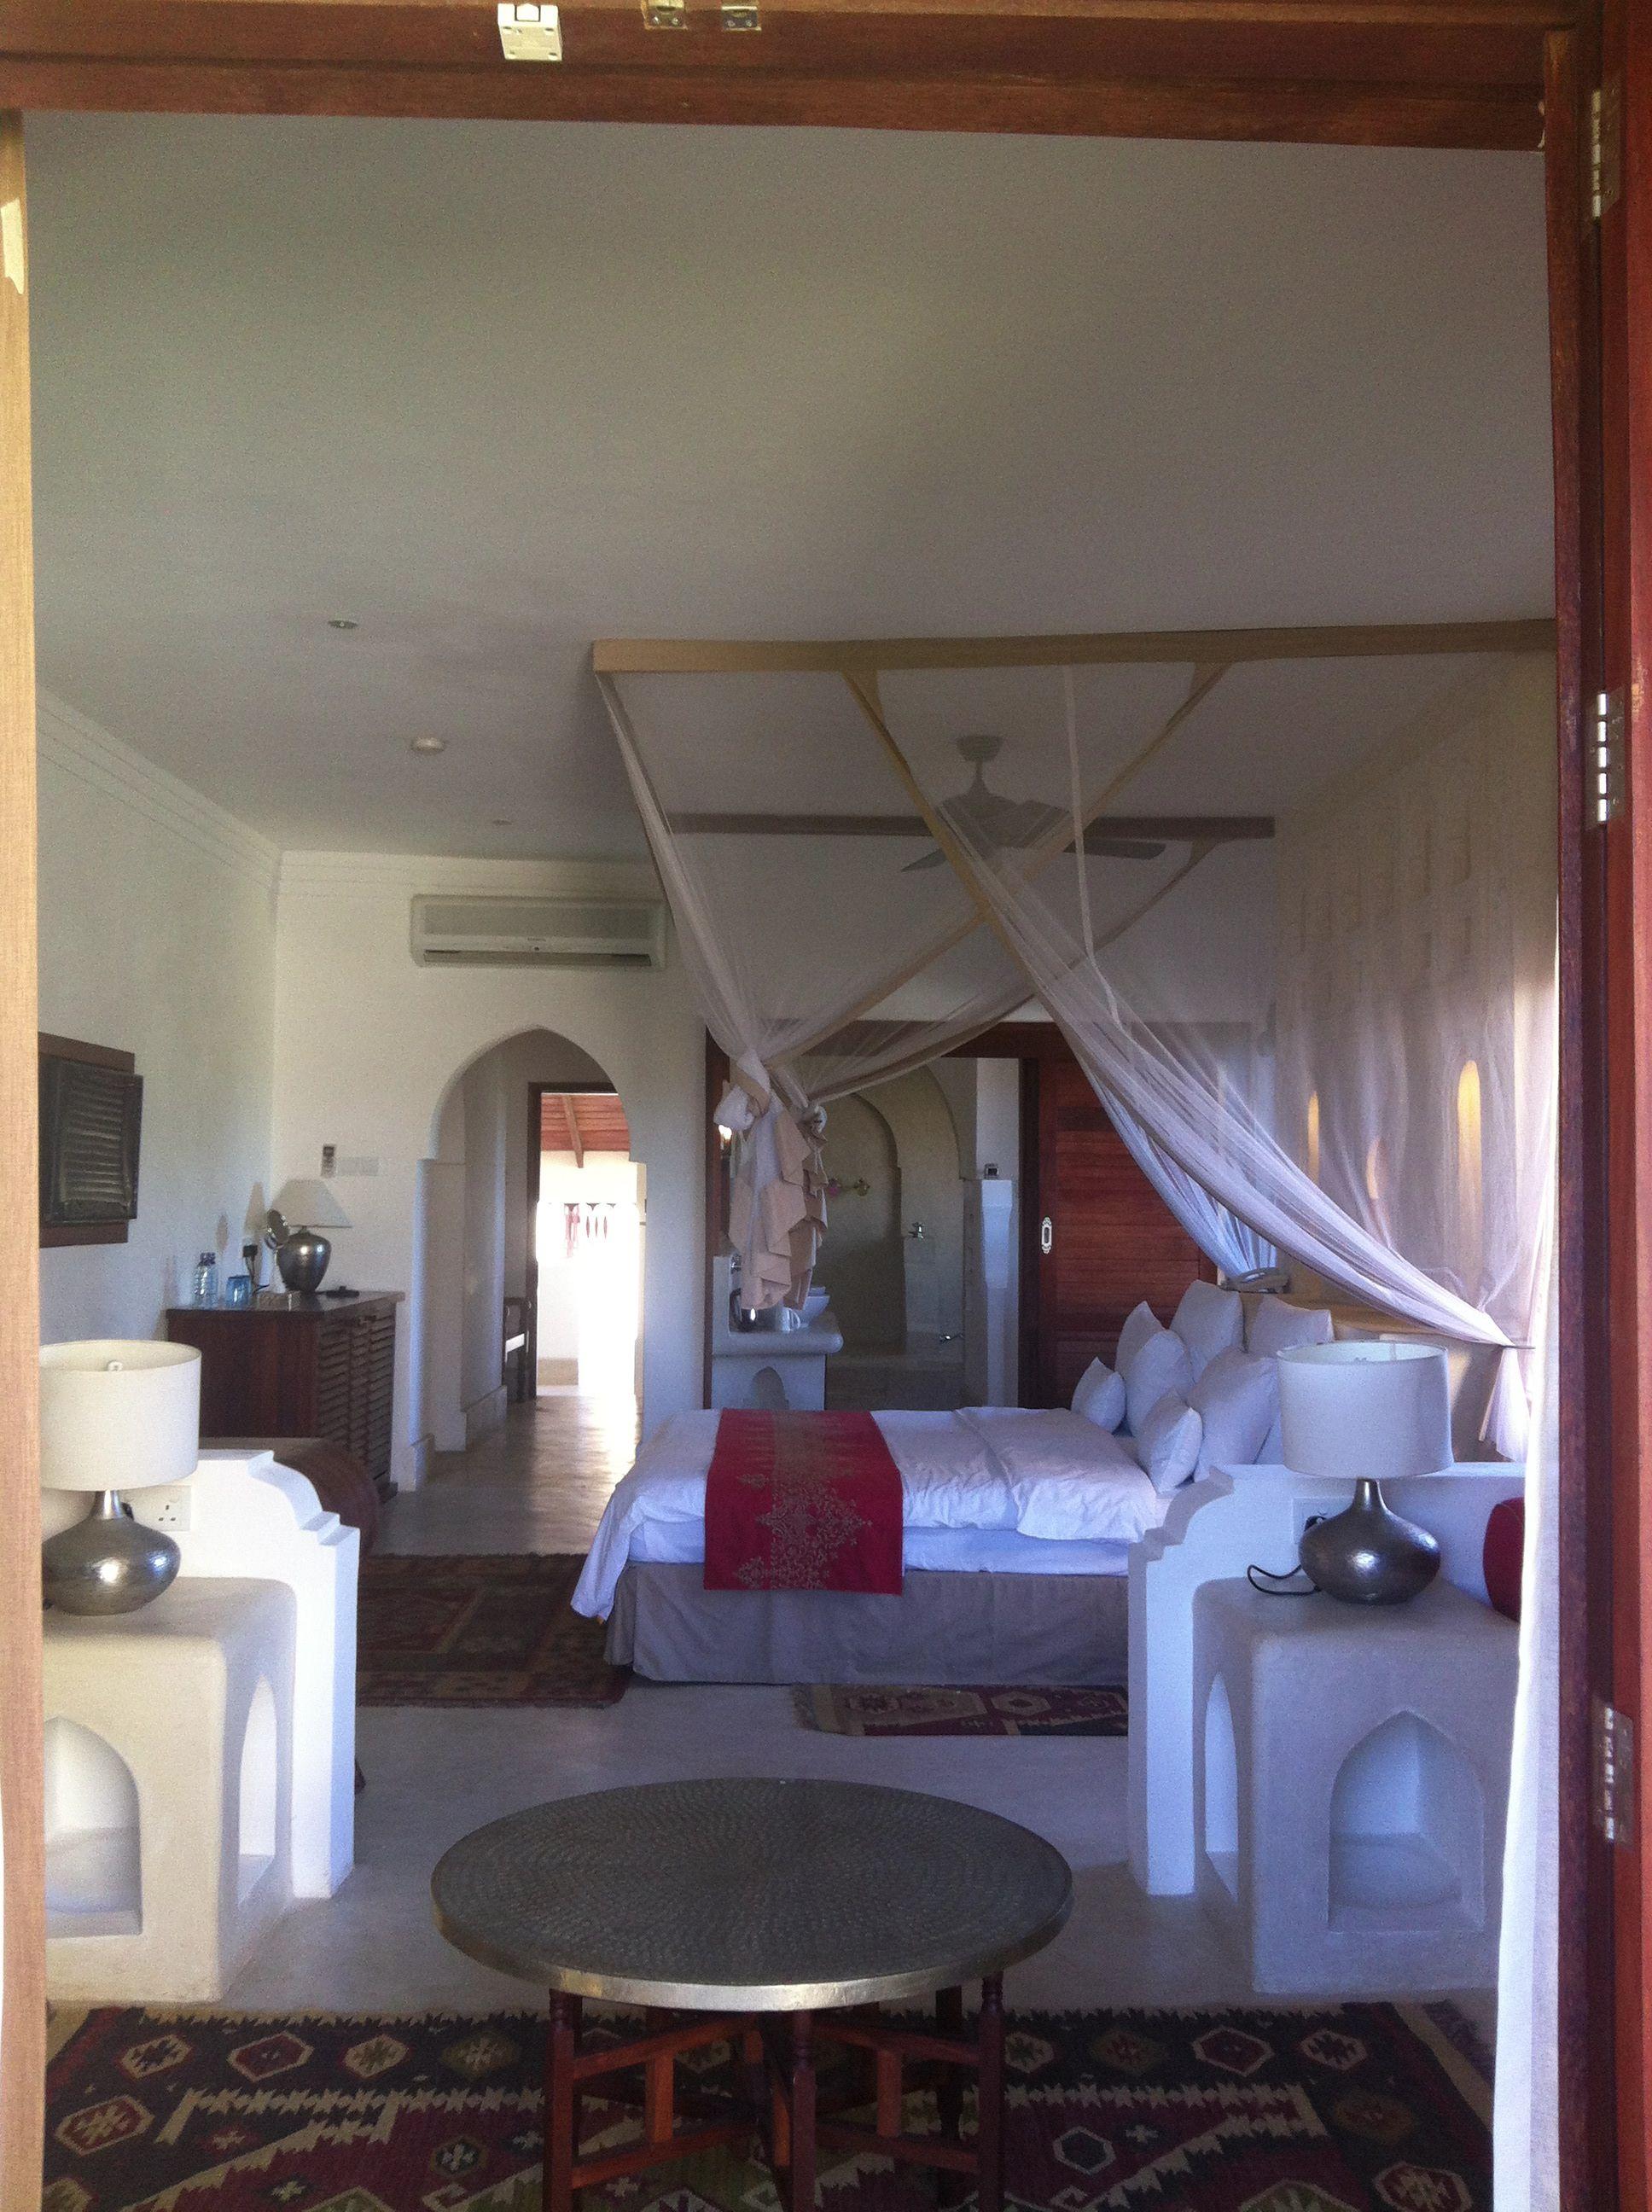 Superior Room At Swahili Beach Hotel Mombasa Kenya Spaces I Love